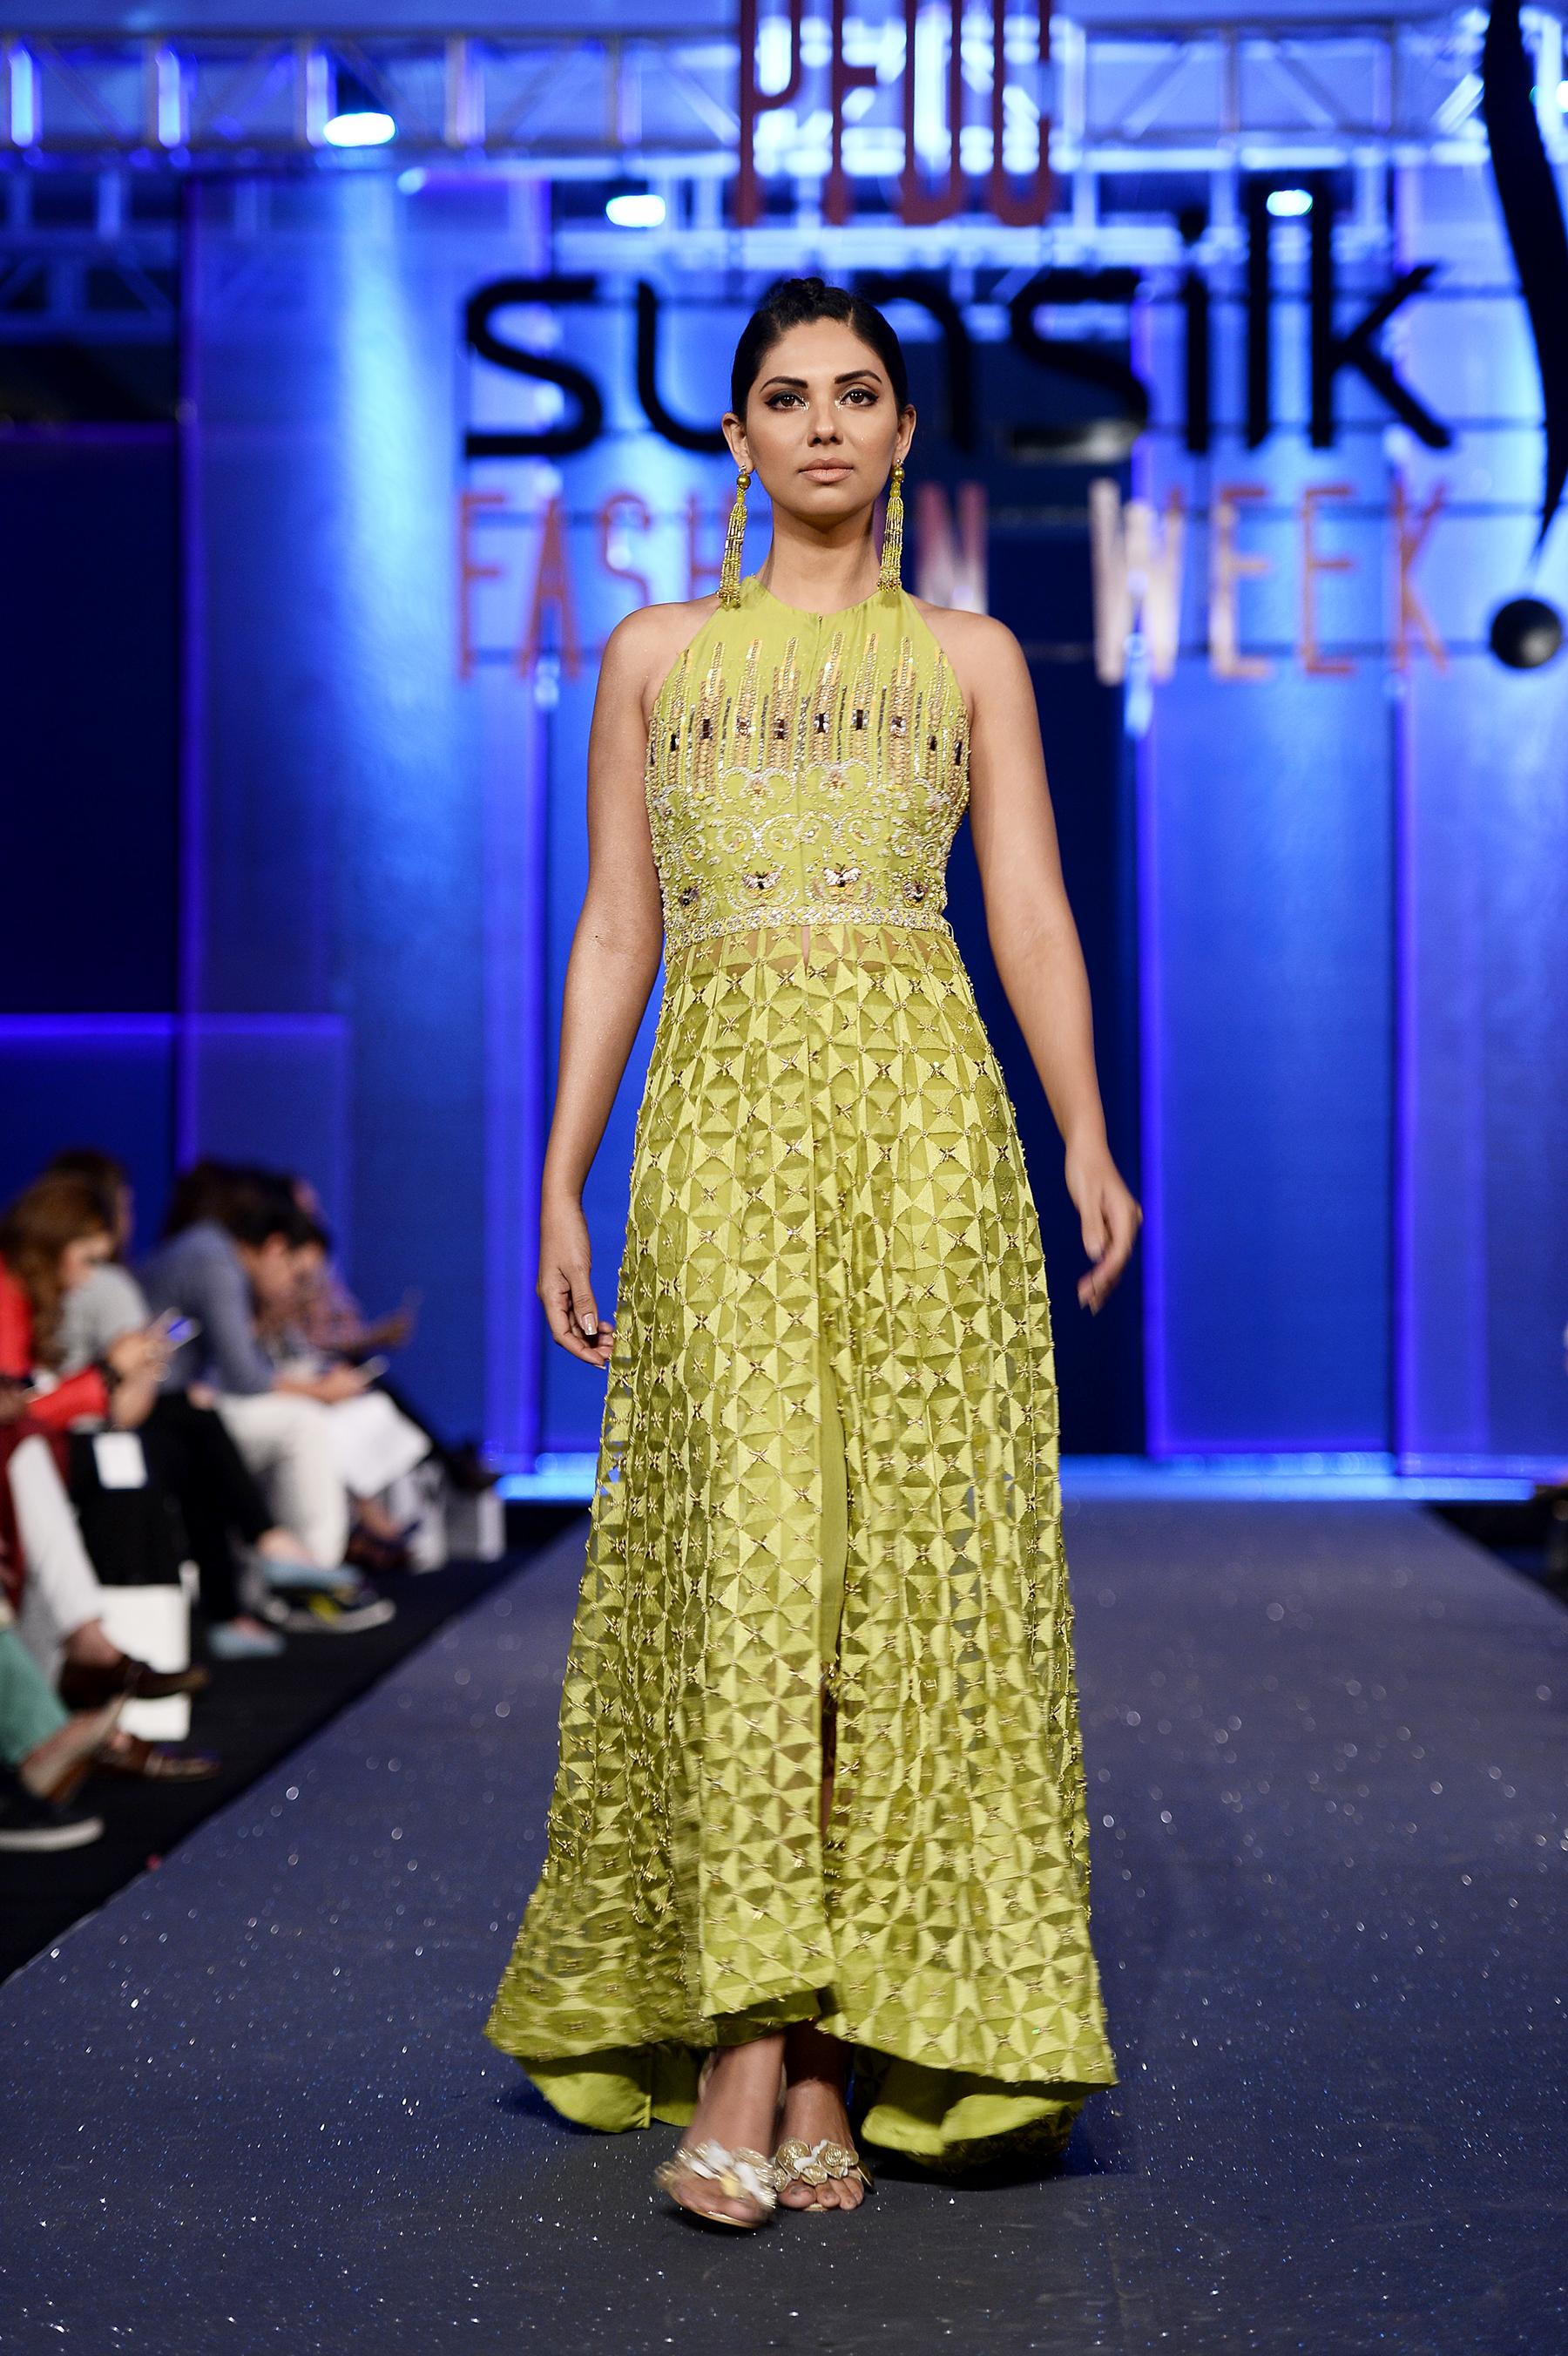 Faiza Saqlain - PFDC Sunsilk Fashion Week 2017, Photography: Faisal Farooqui and his team at Dragonfly